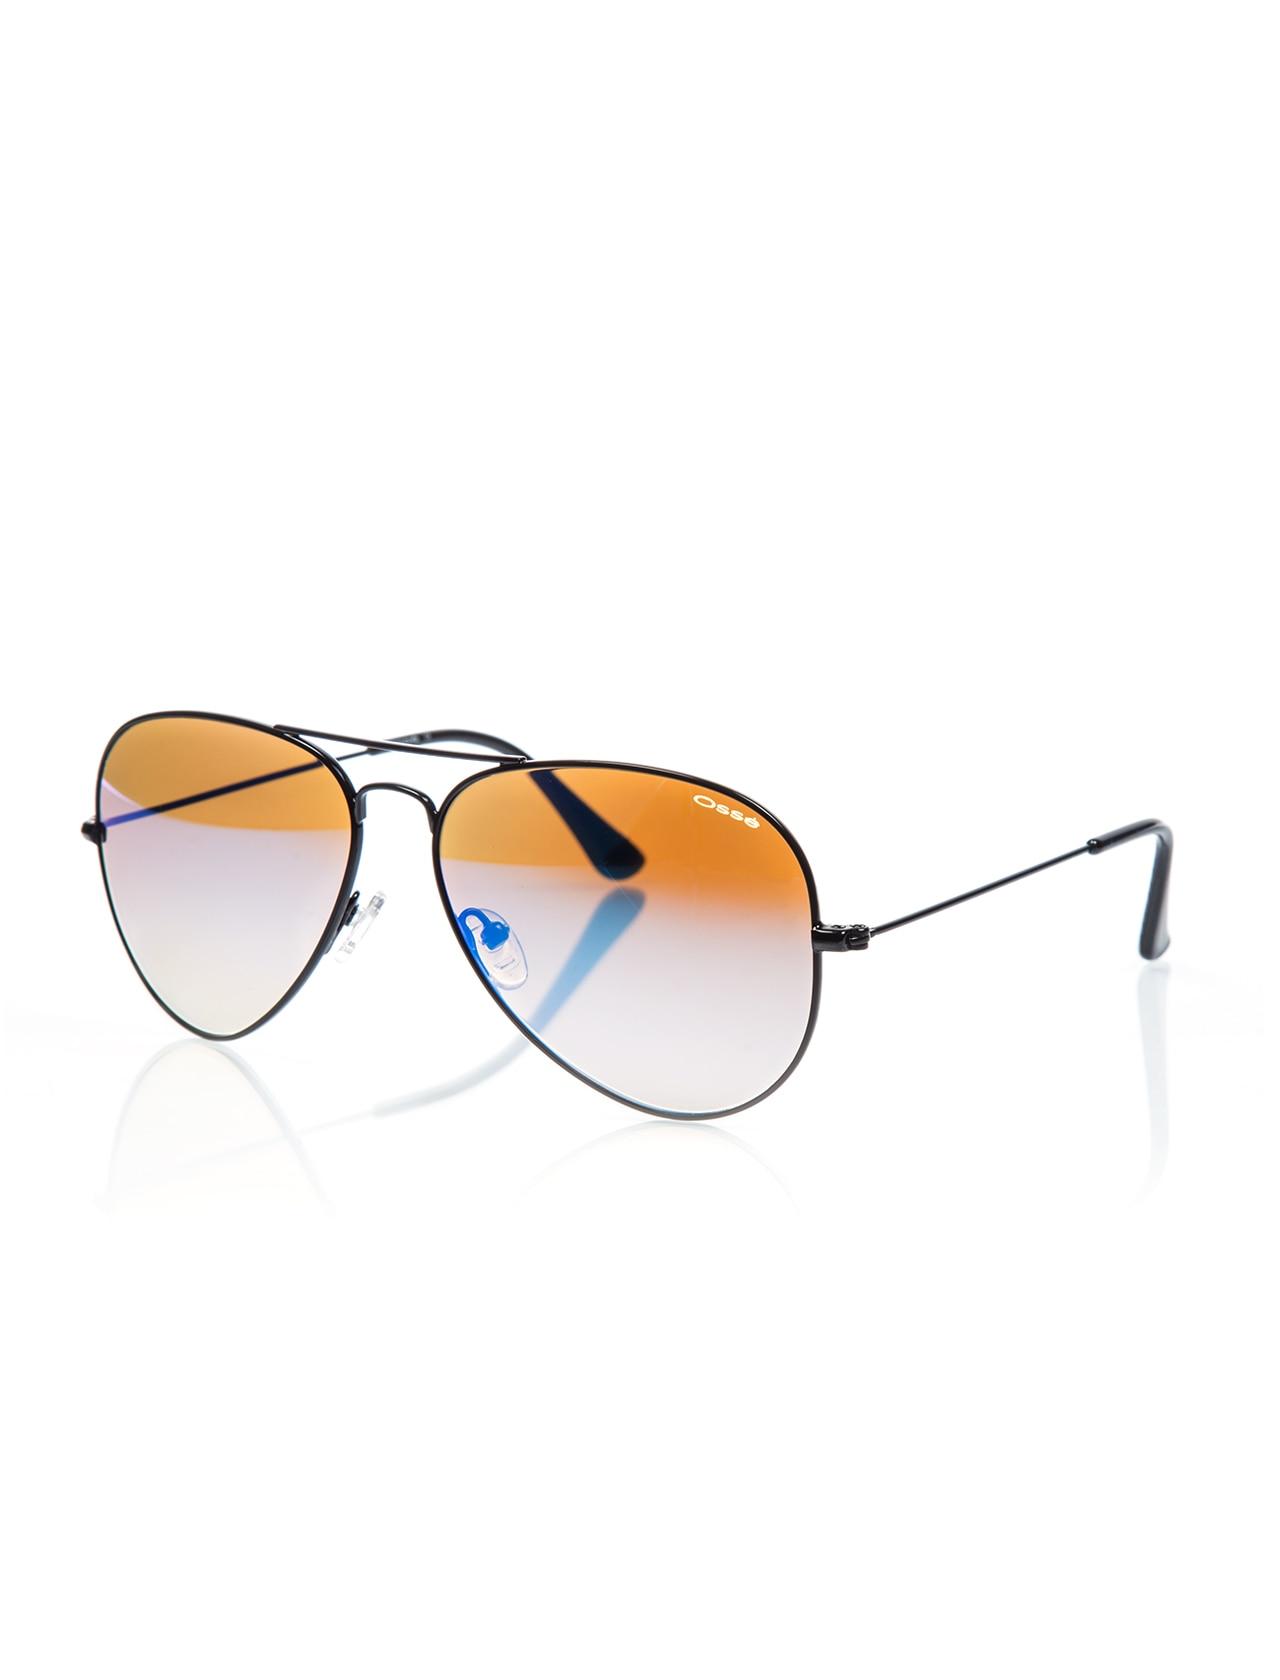 Unisex sunglasses os 2183 12 metal black crystal drop pilot 58-14-135 osse